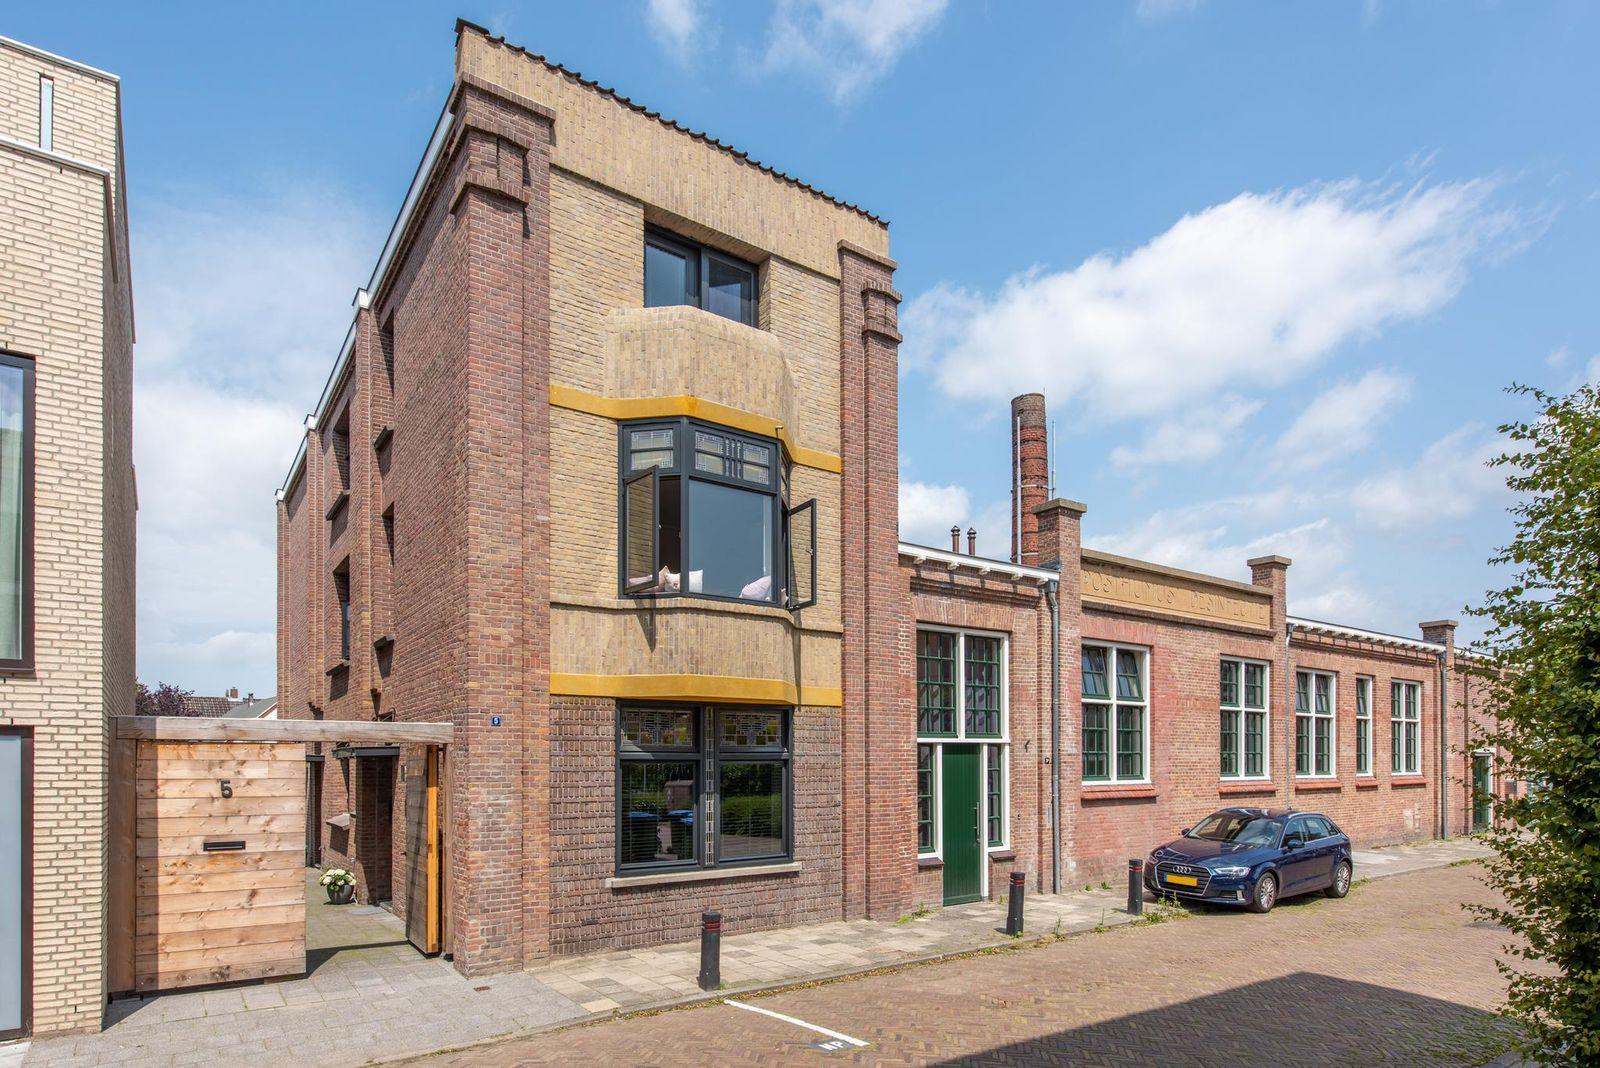 Zonnebloemstraat 5, Breda